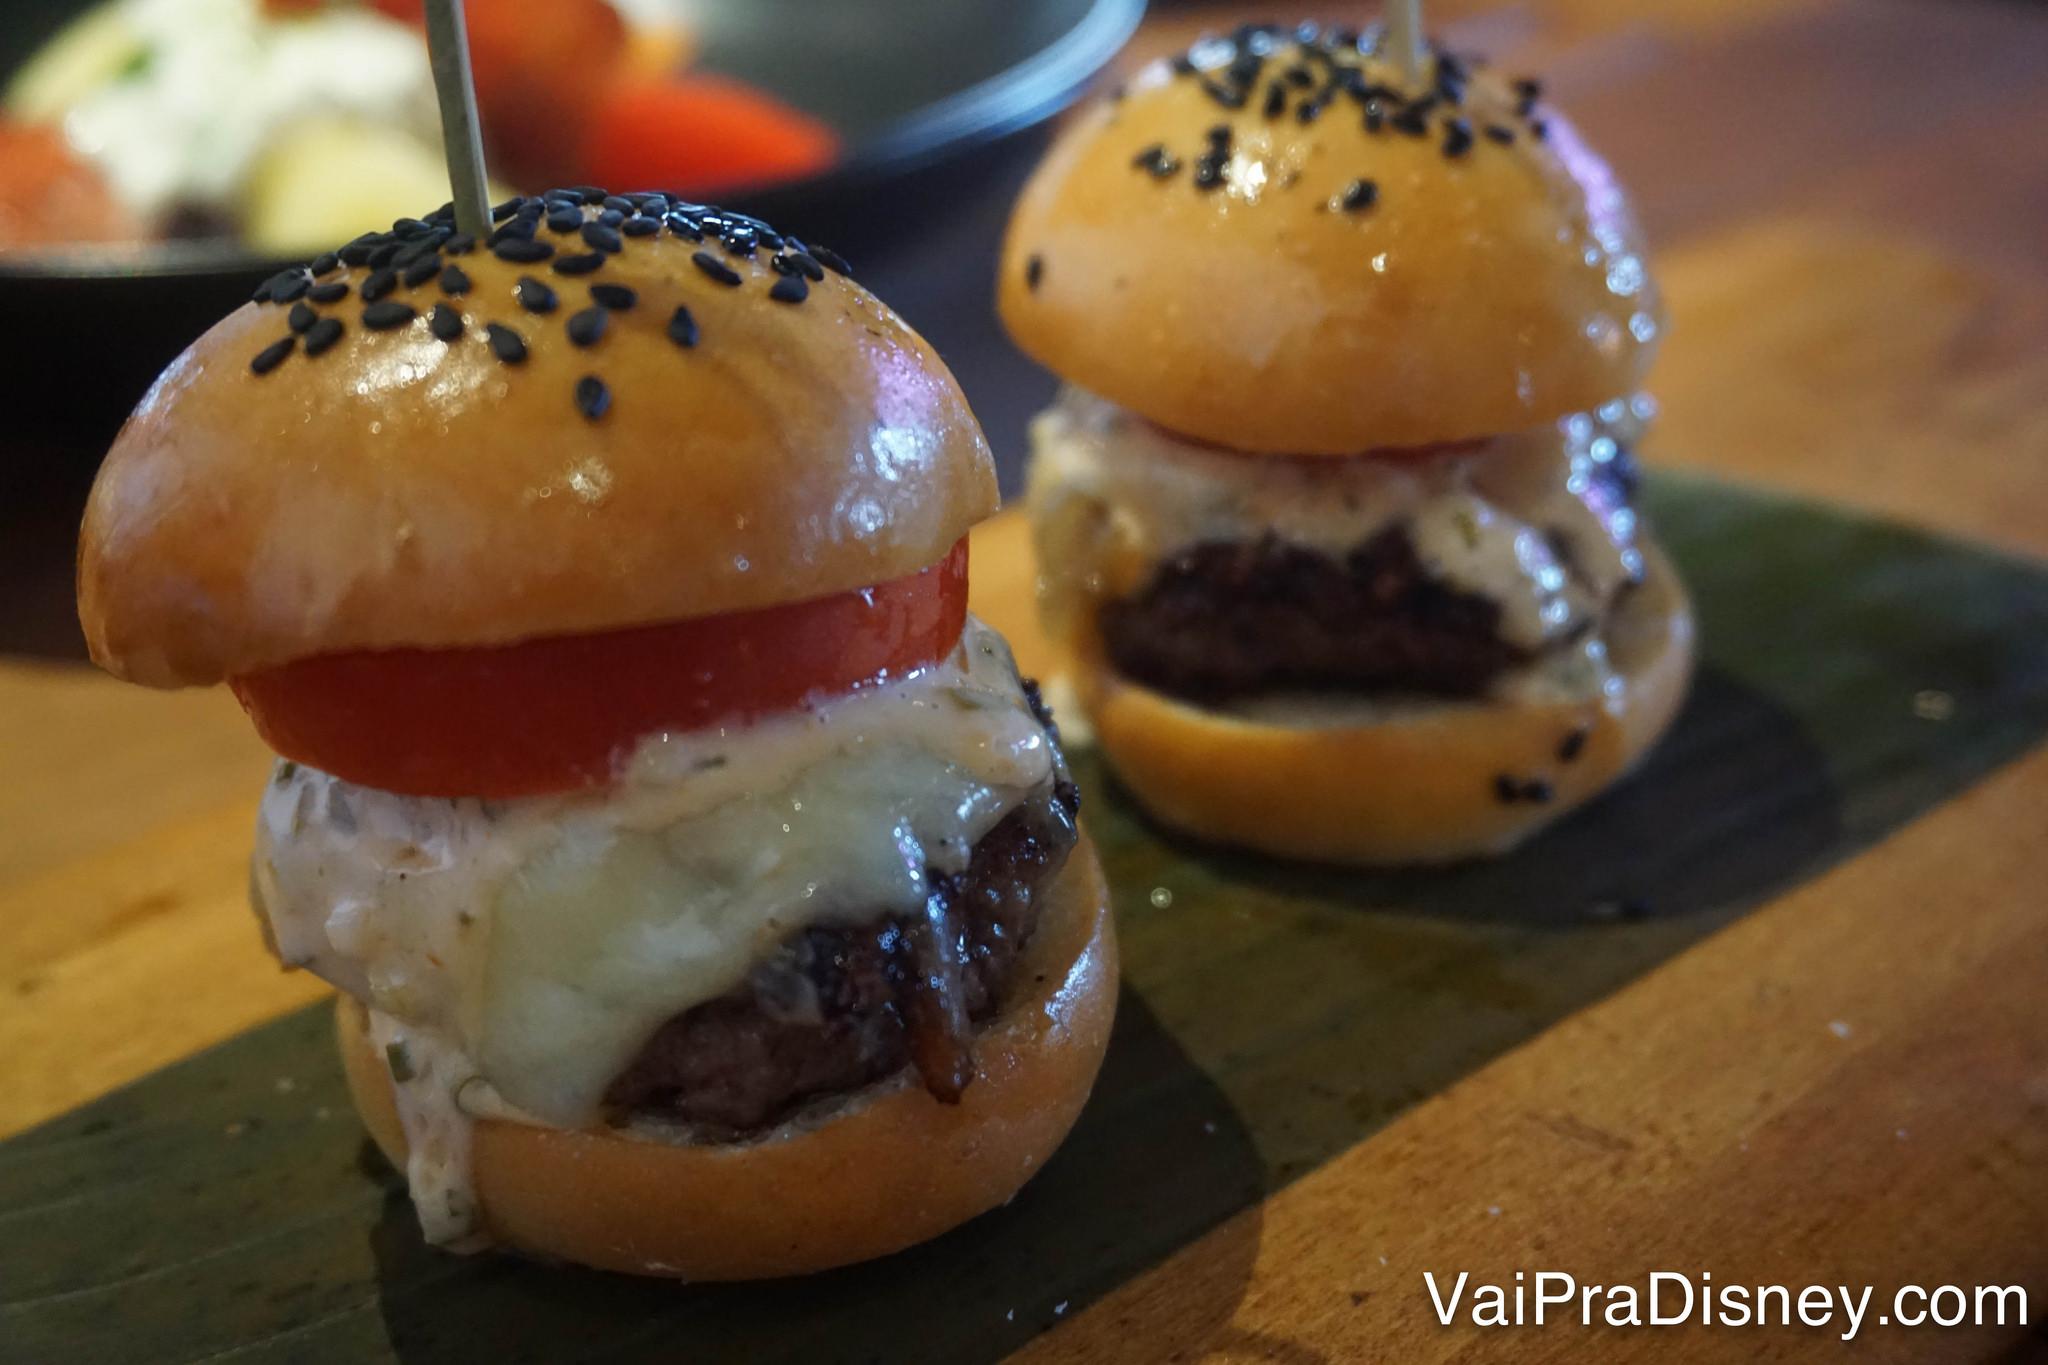 Foto de dois mini cheeseburgers servidos no almoço